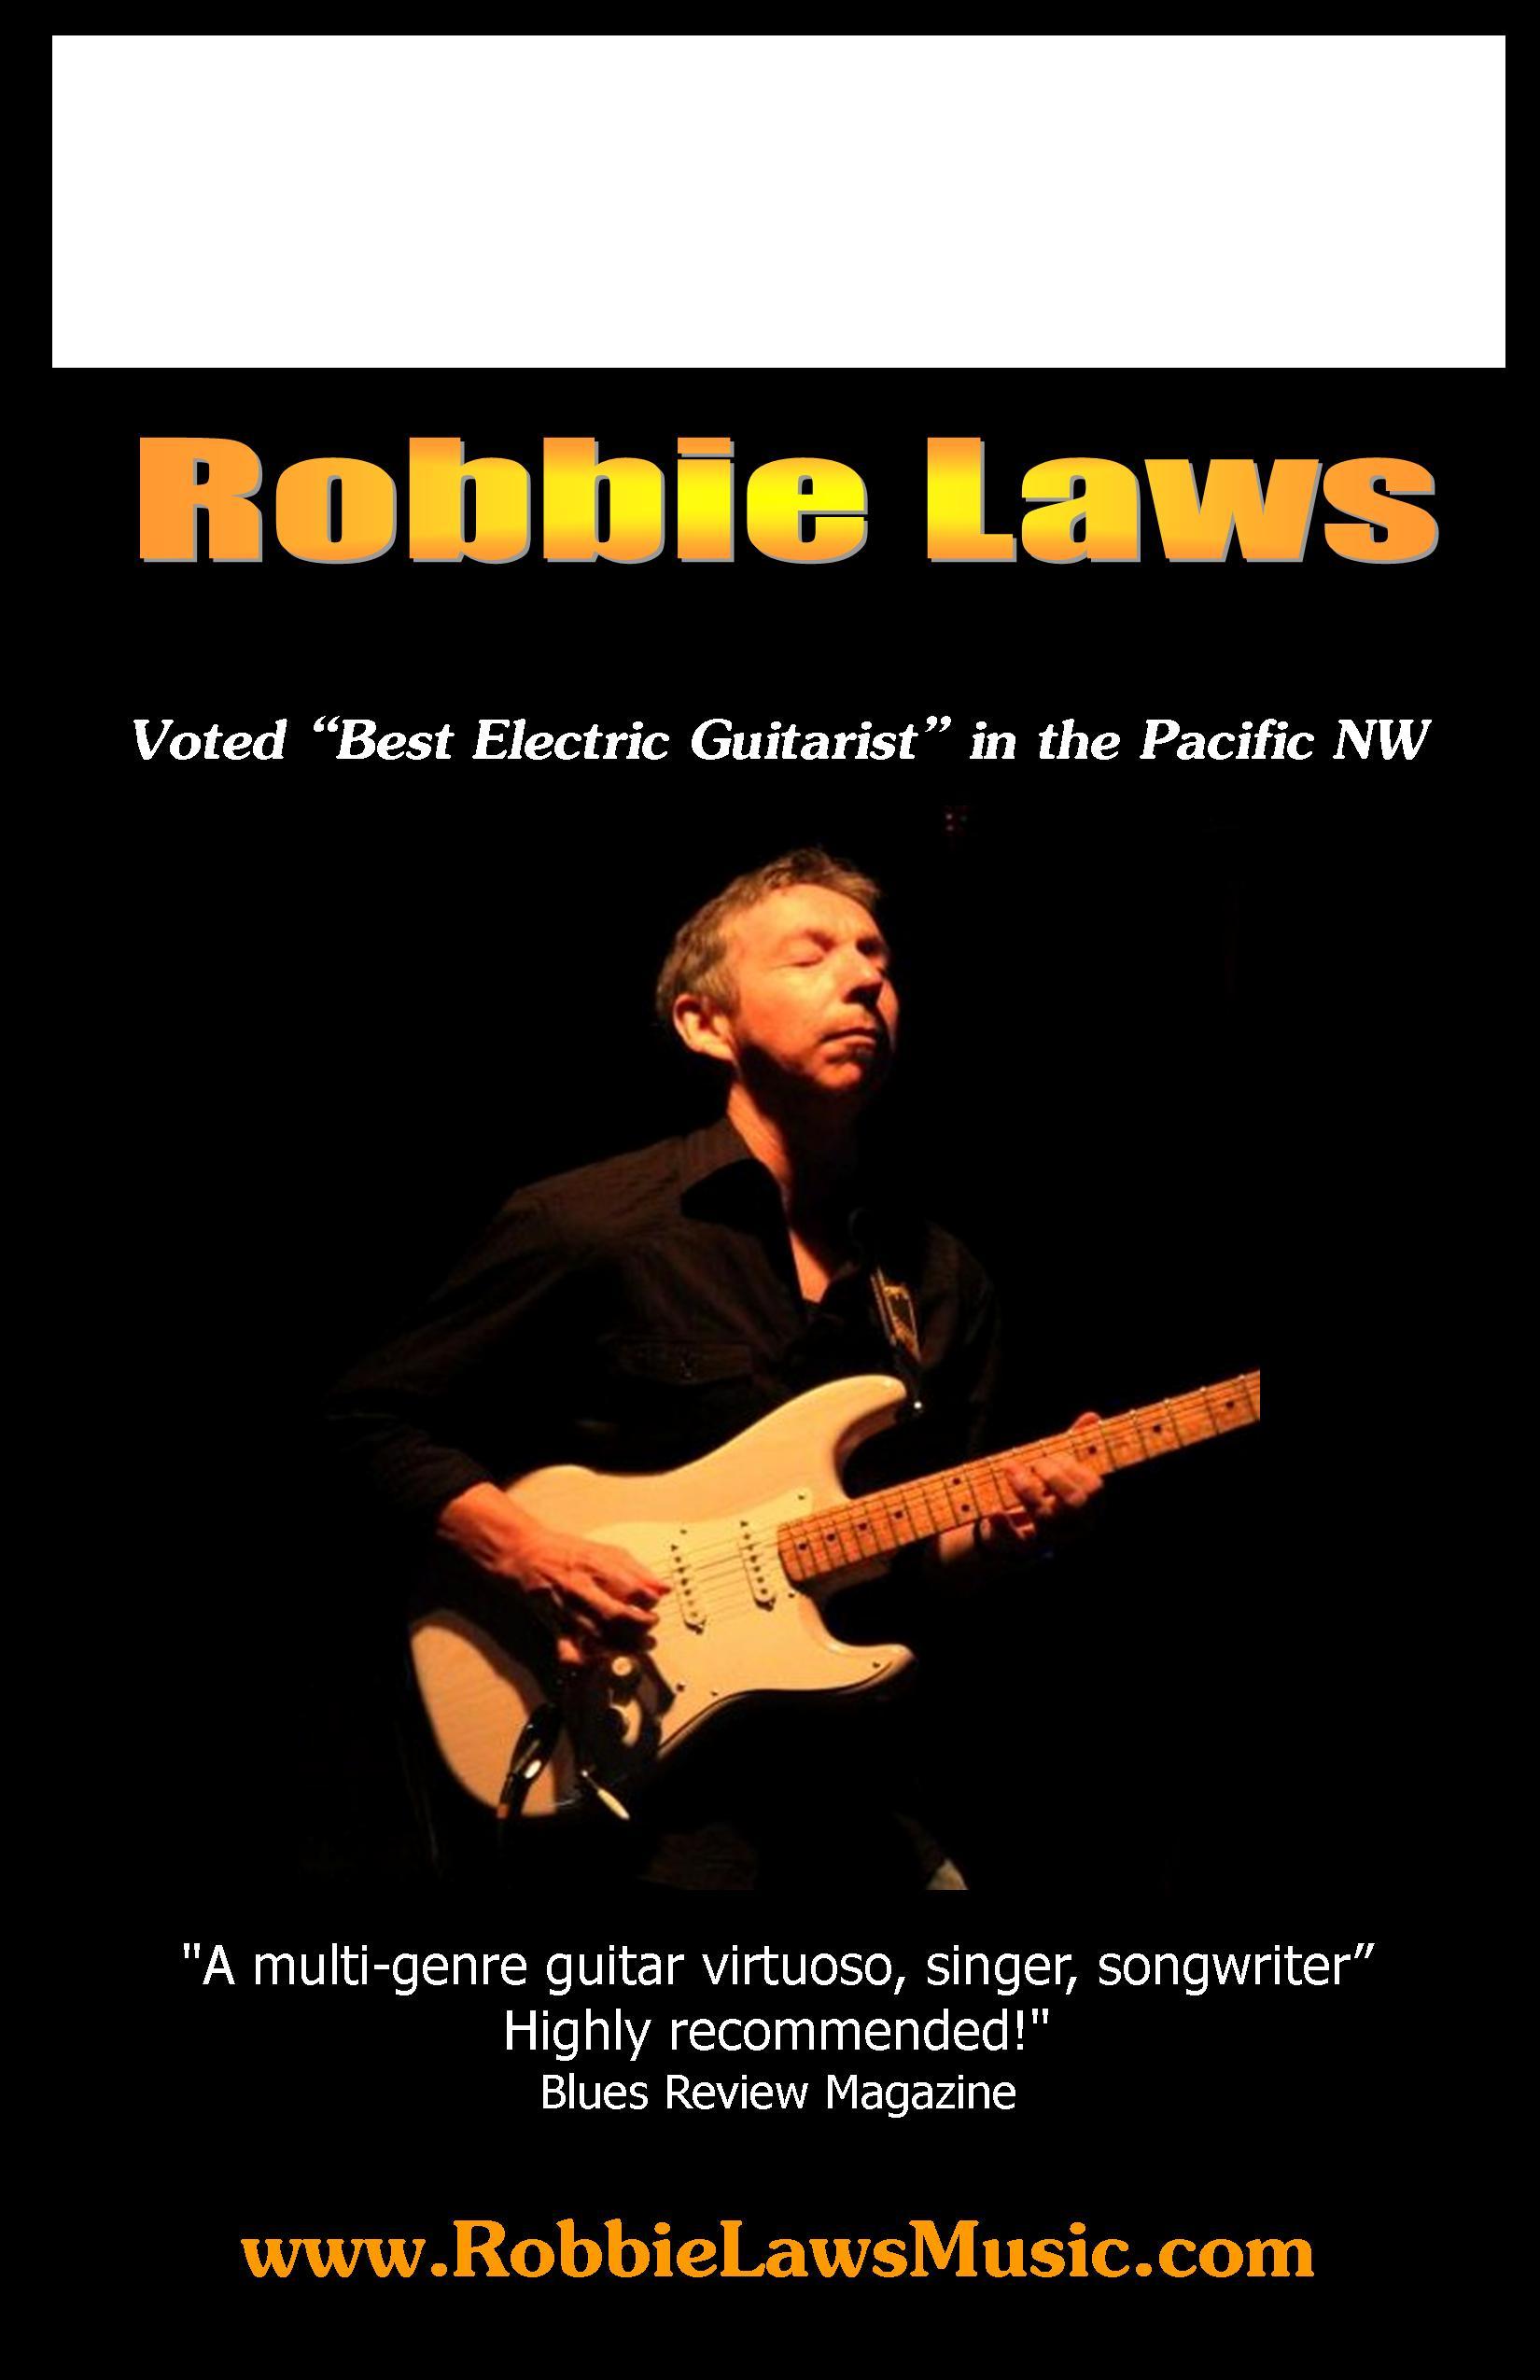 RobbieLaws.Poster.jpg